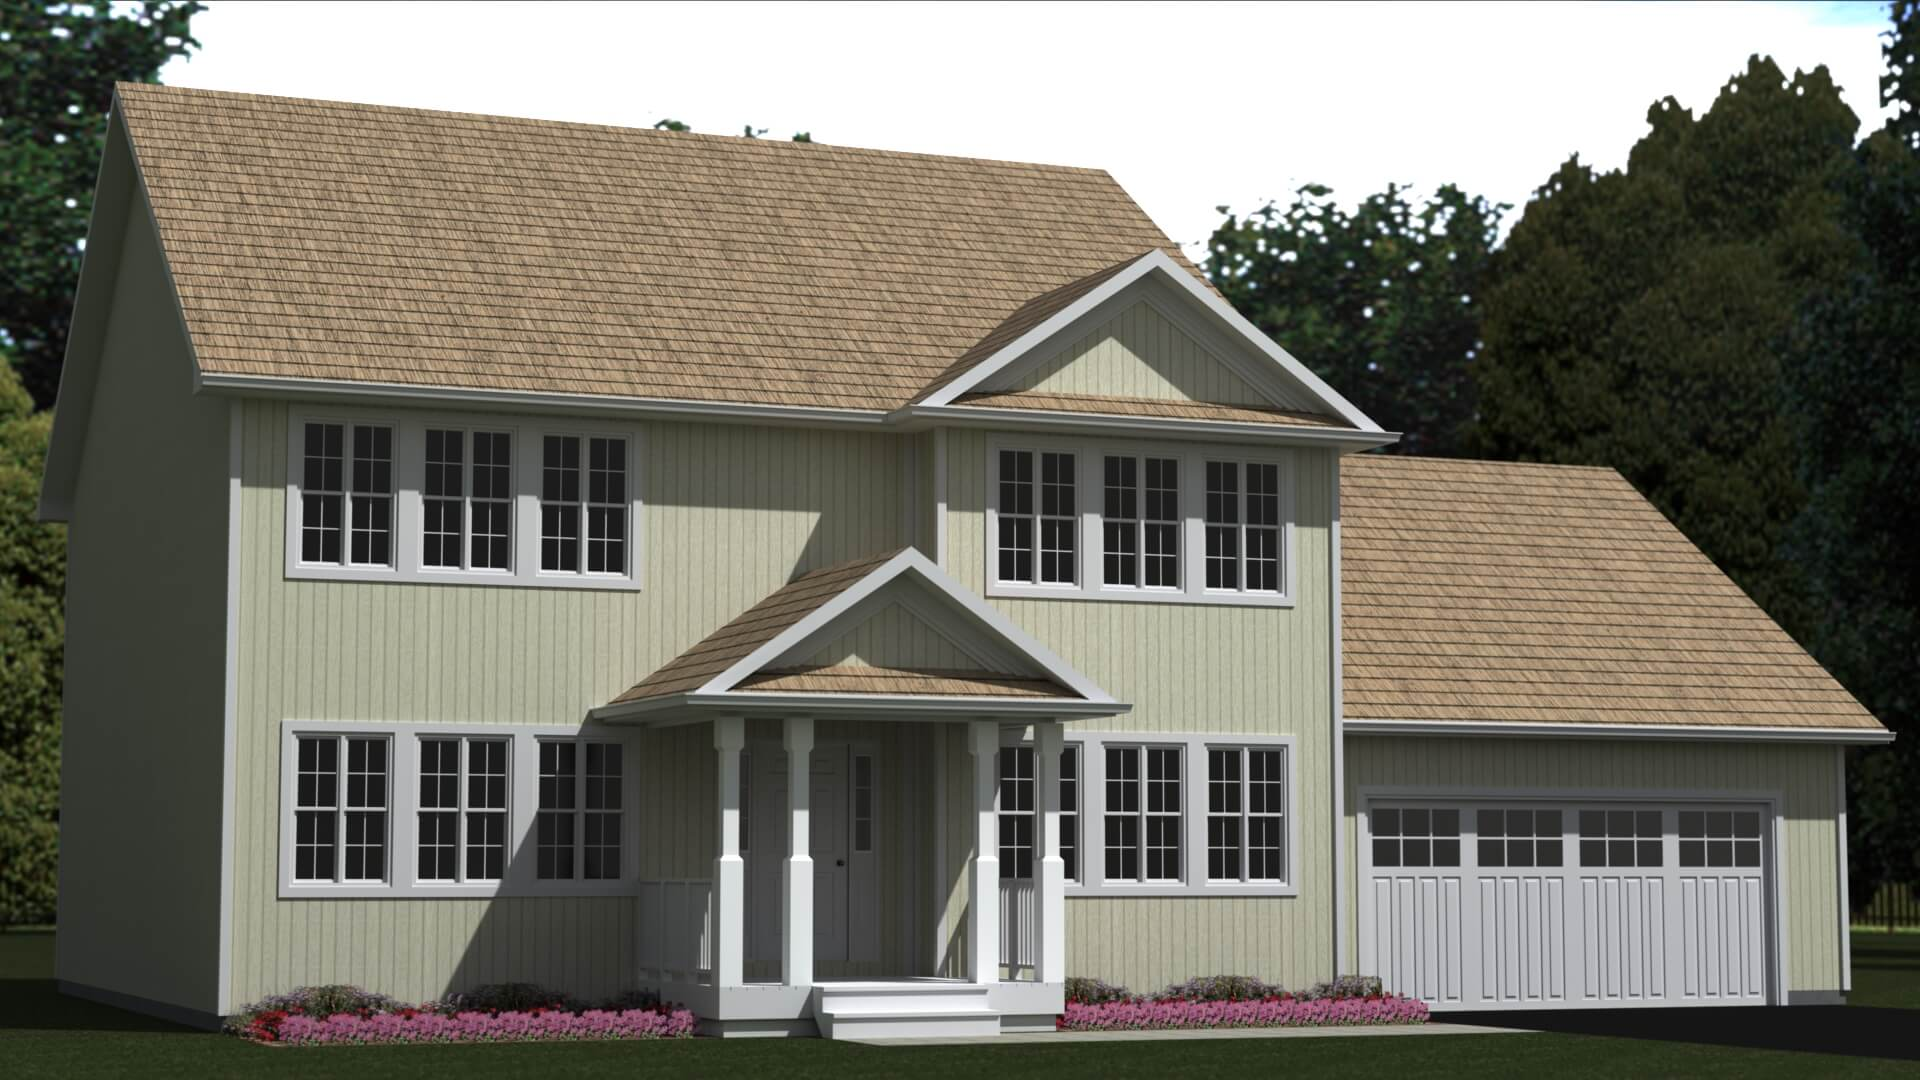 2651_house elevation